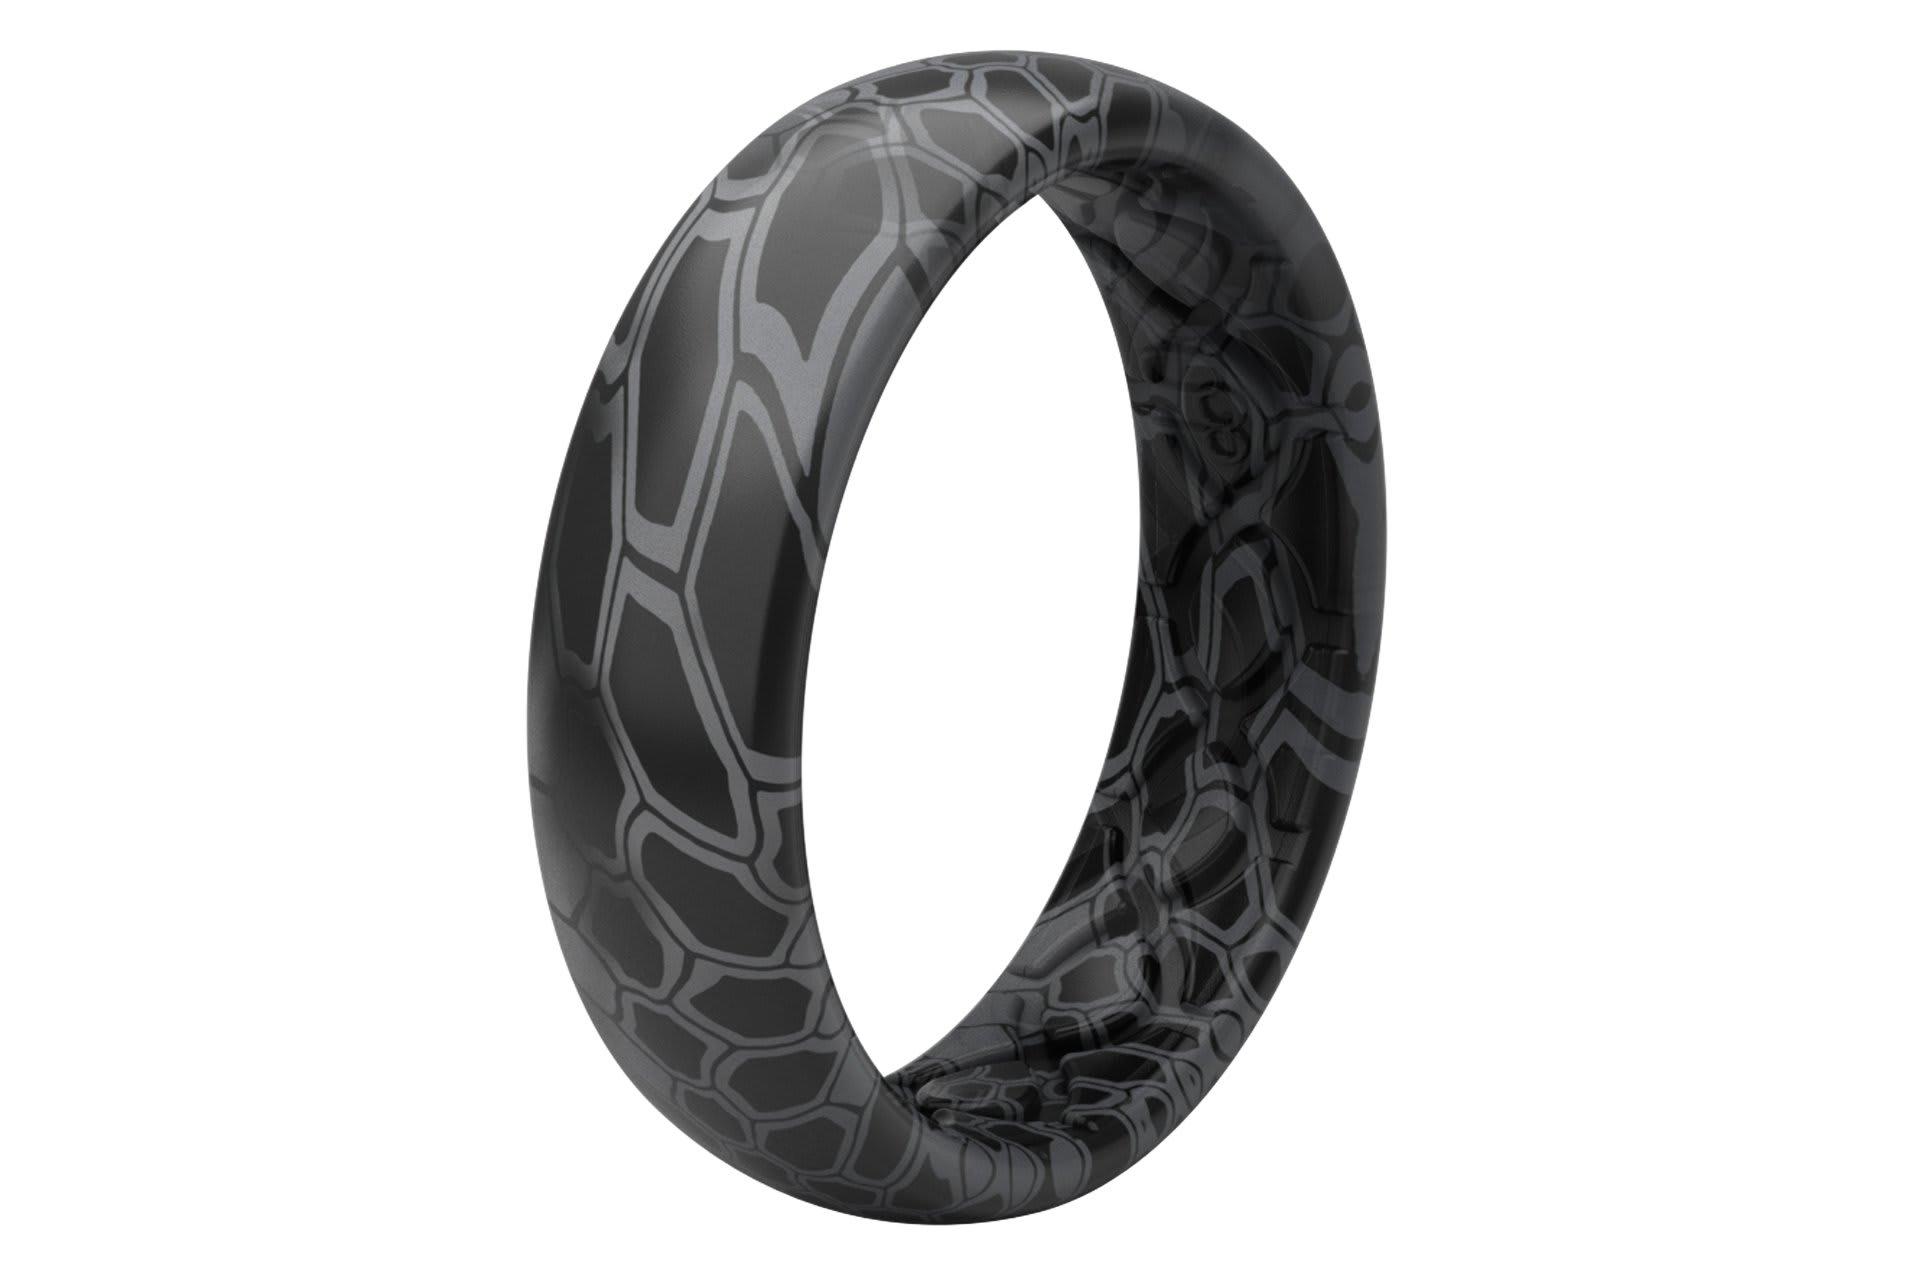 Thin Camo Kryptek Typhon - Groove Life Silicone Wedding Rings